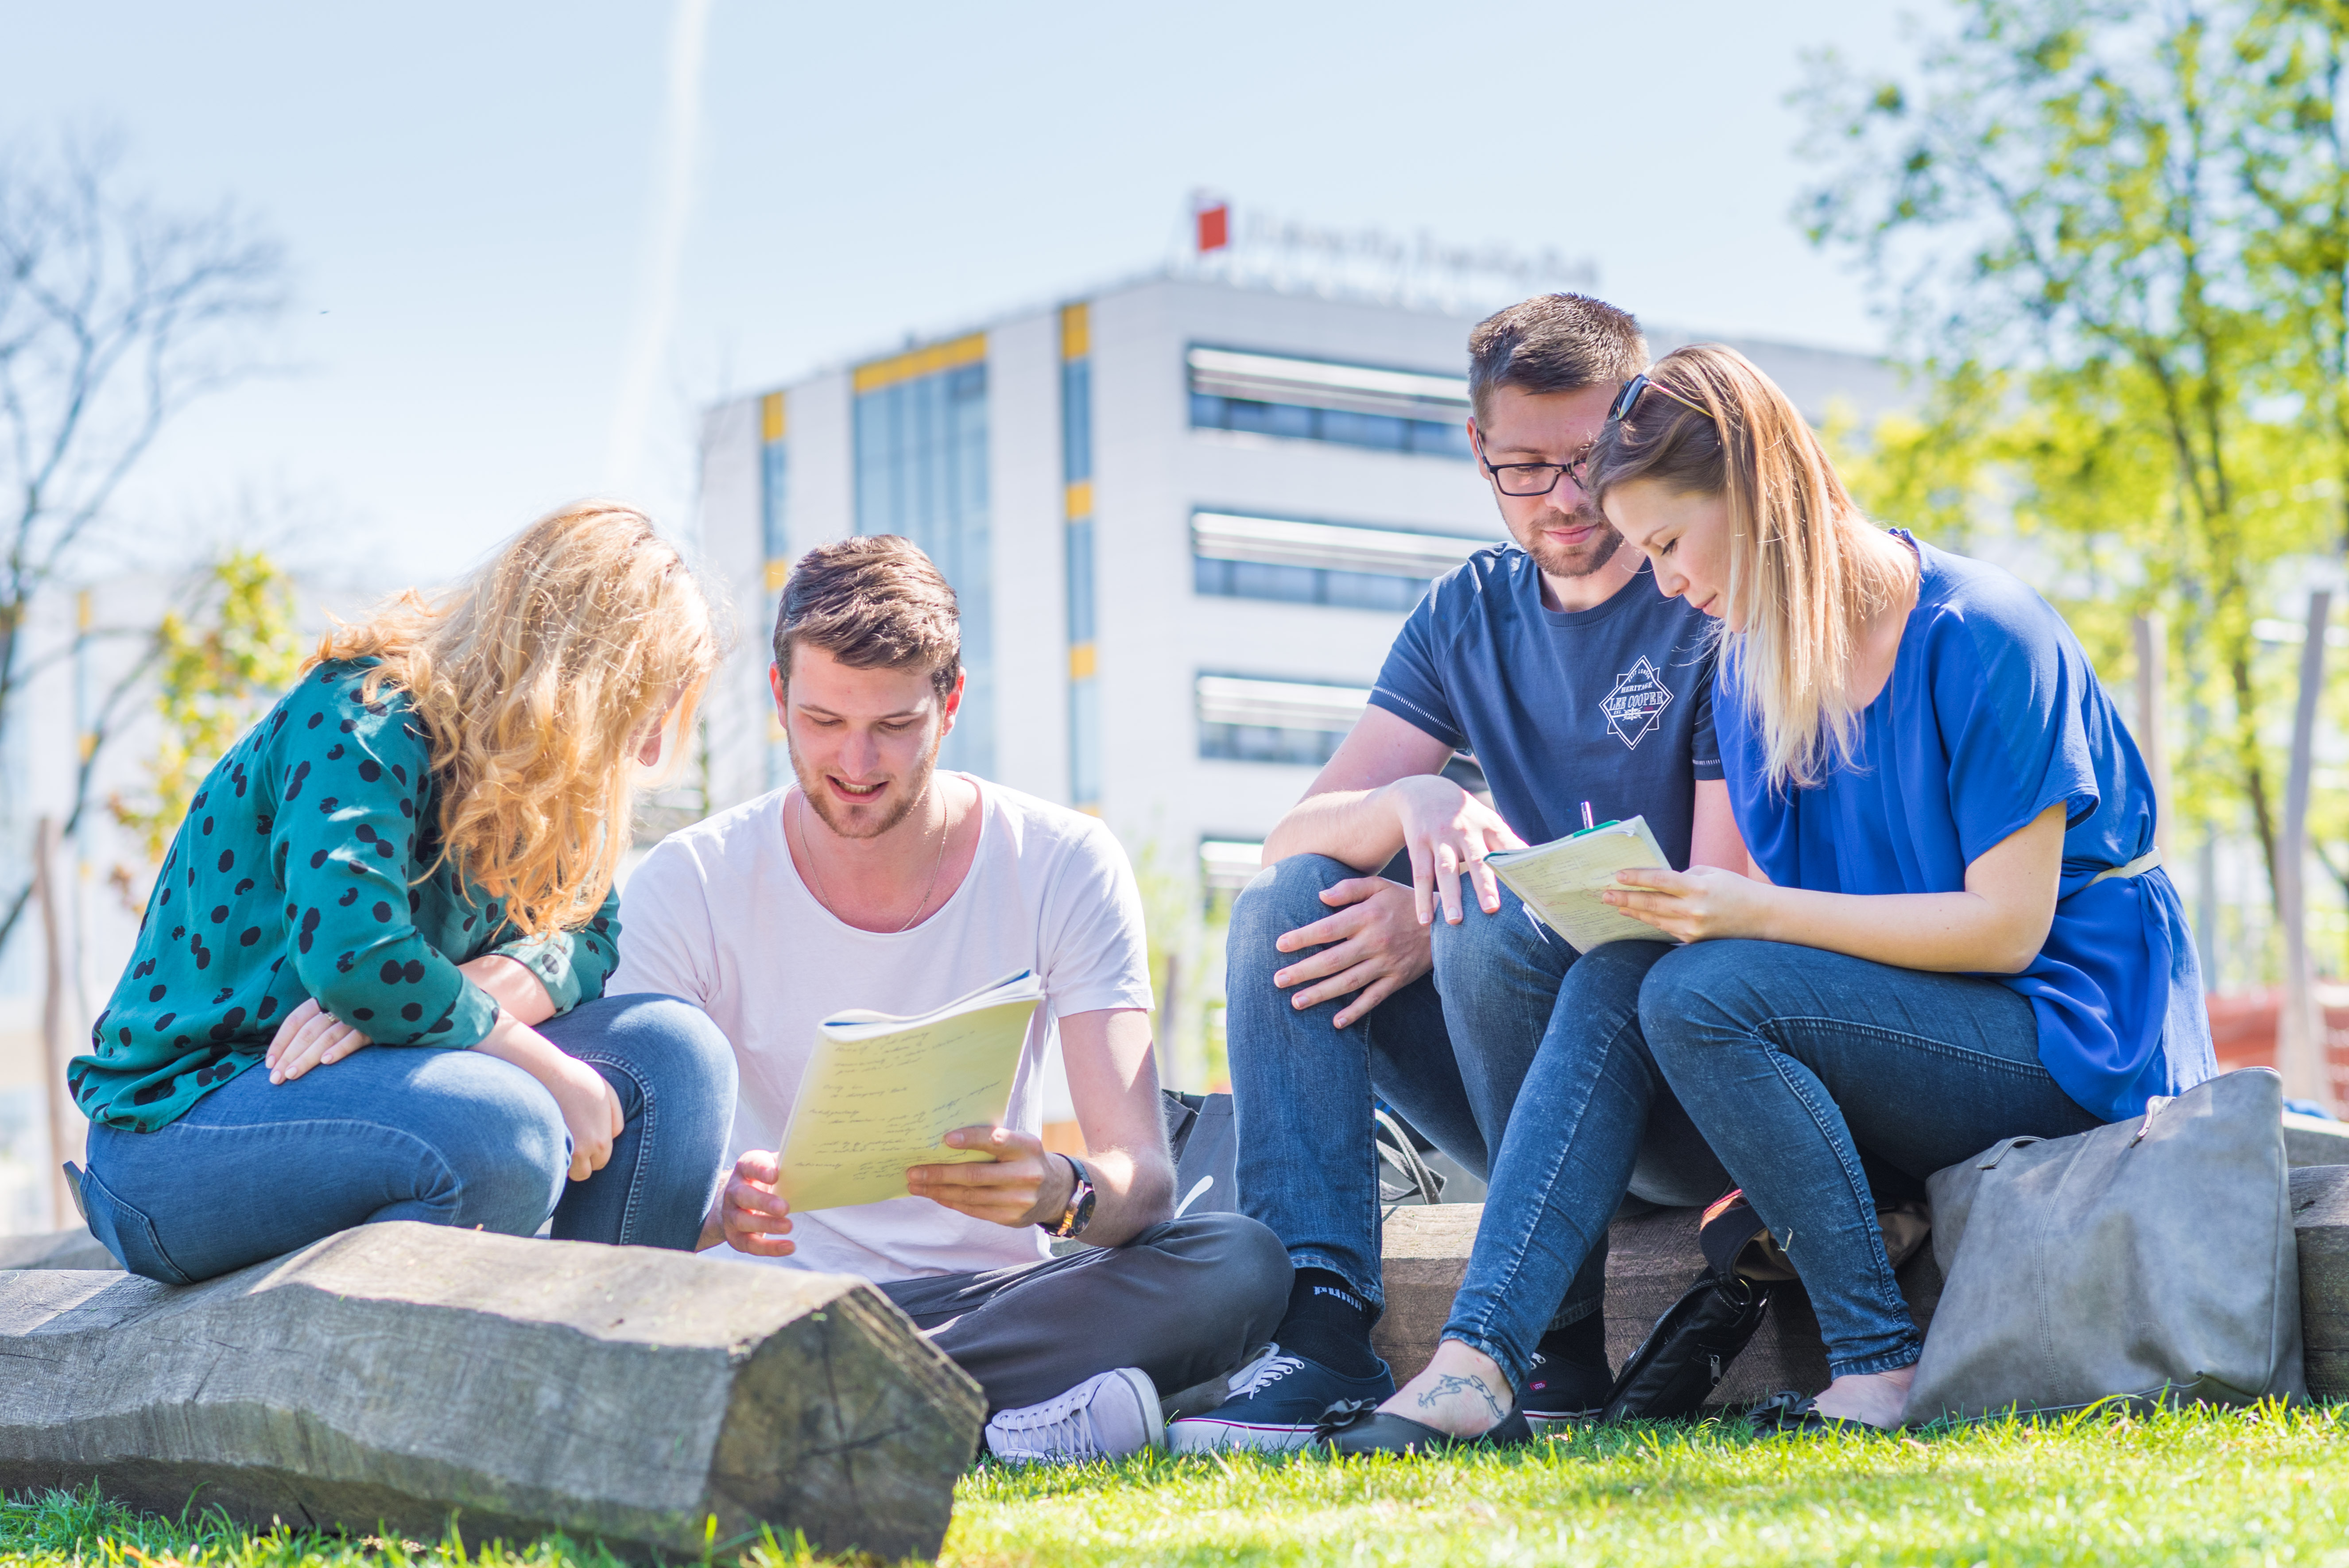 Students Thomas Bata university